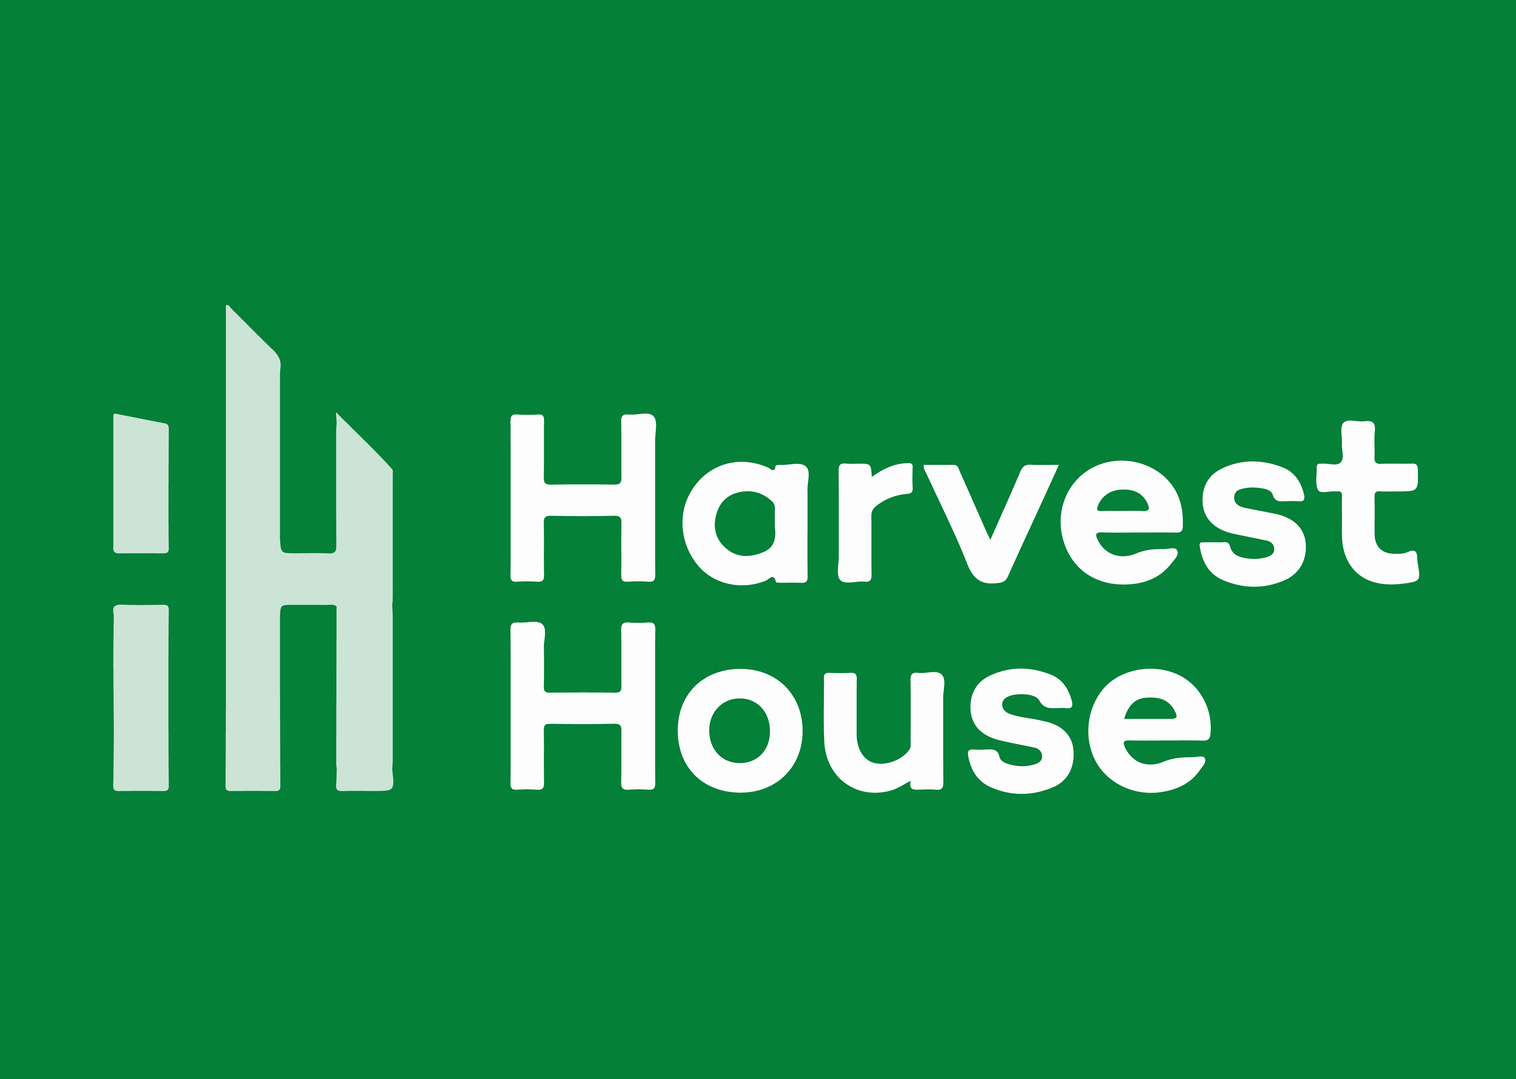 Decorum_witgroen_Harvest house.png